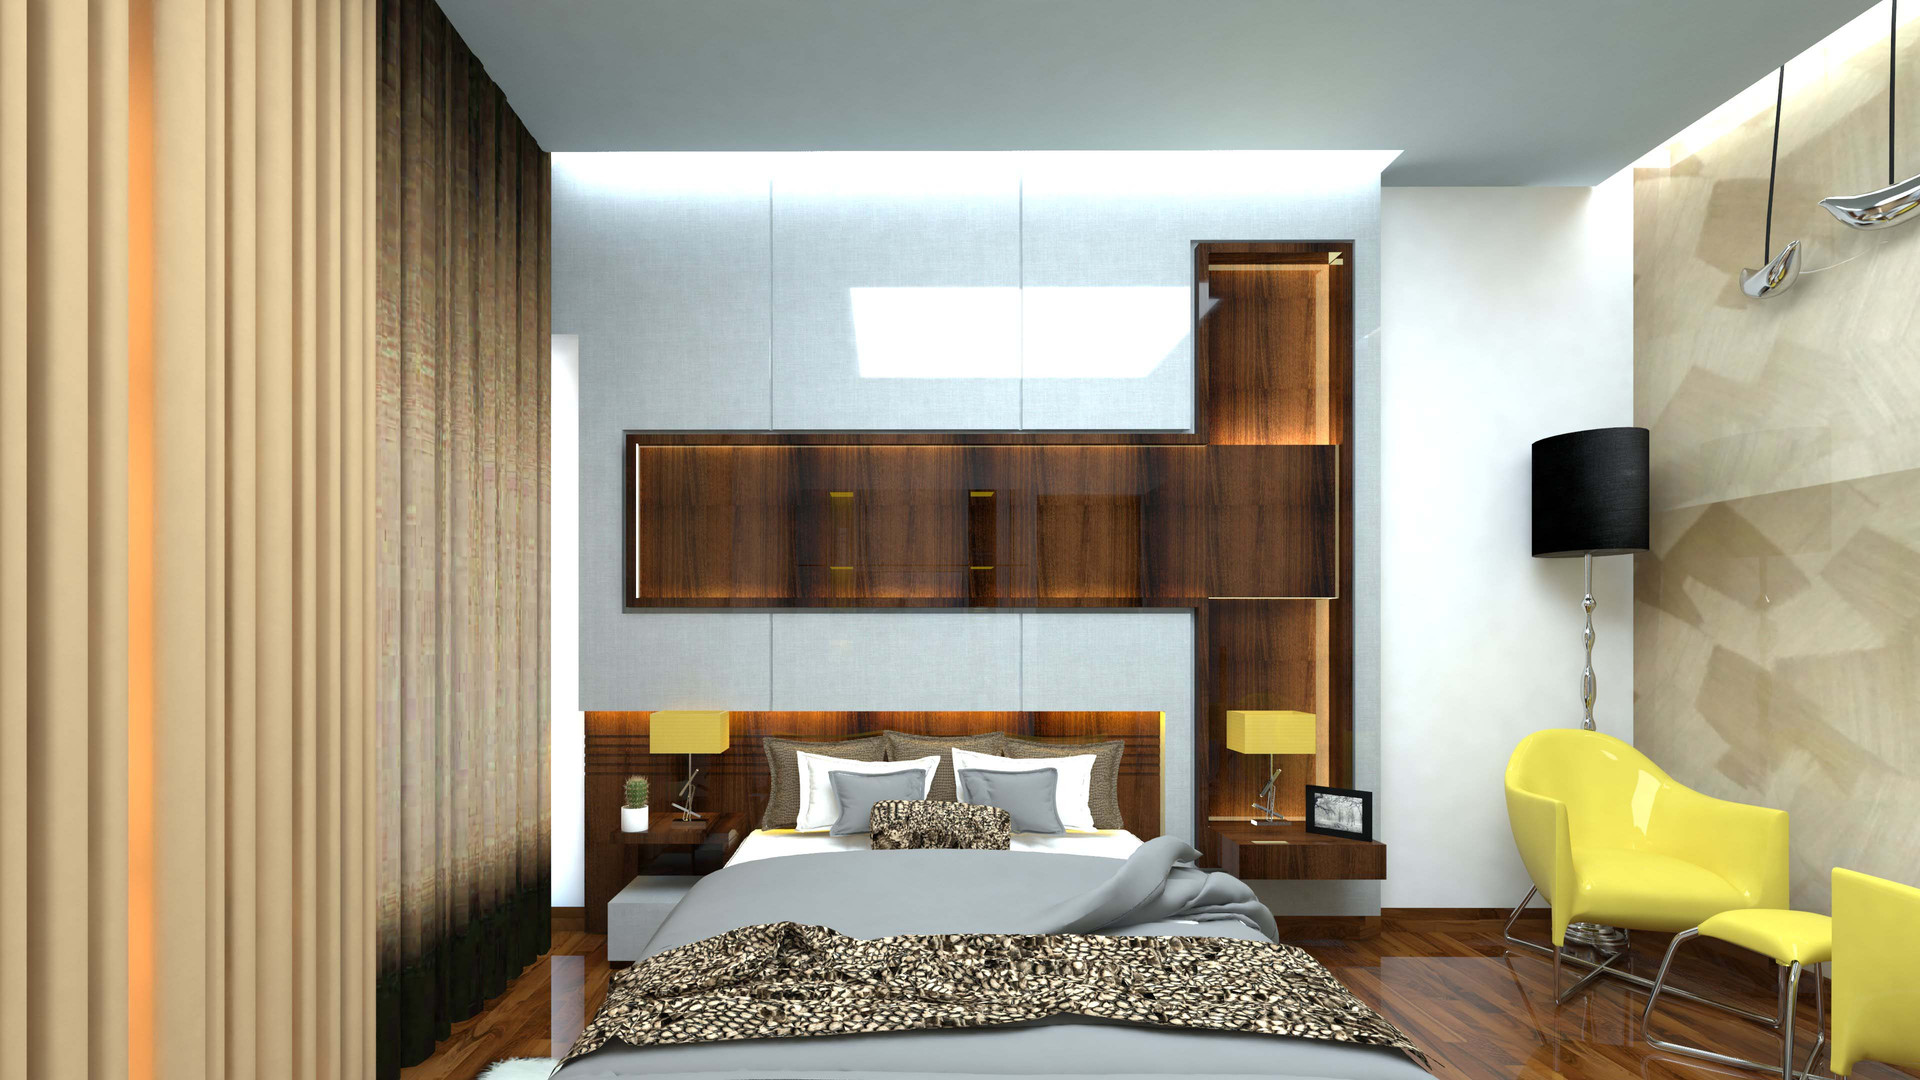 1st bed 1 -1.jpg